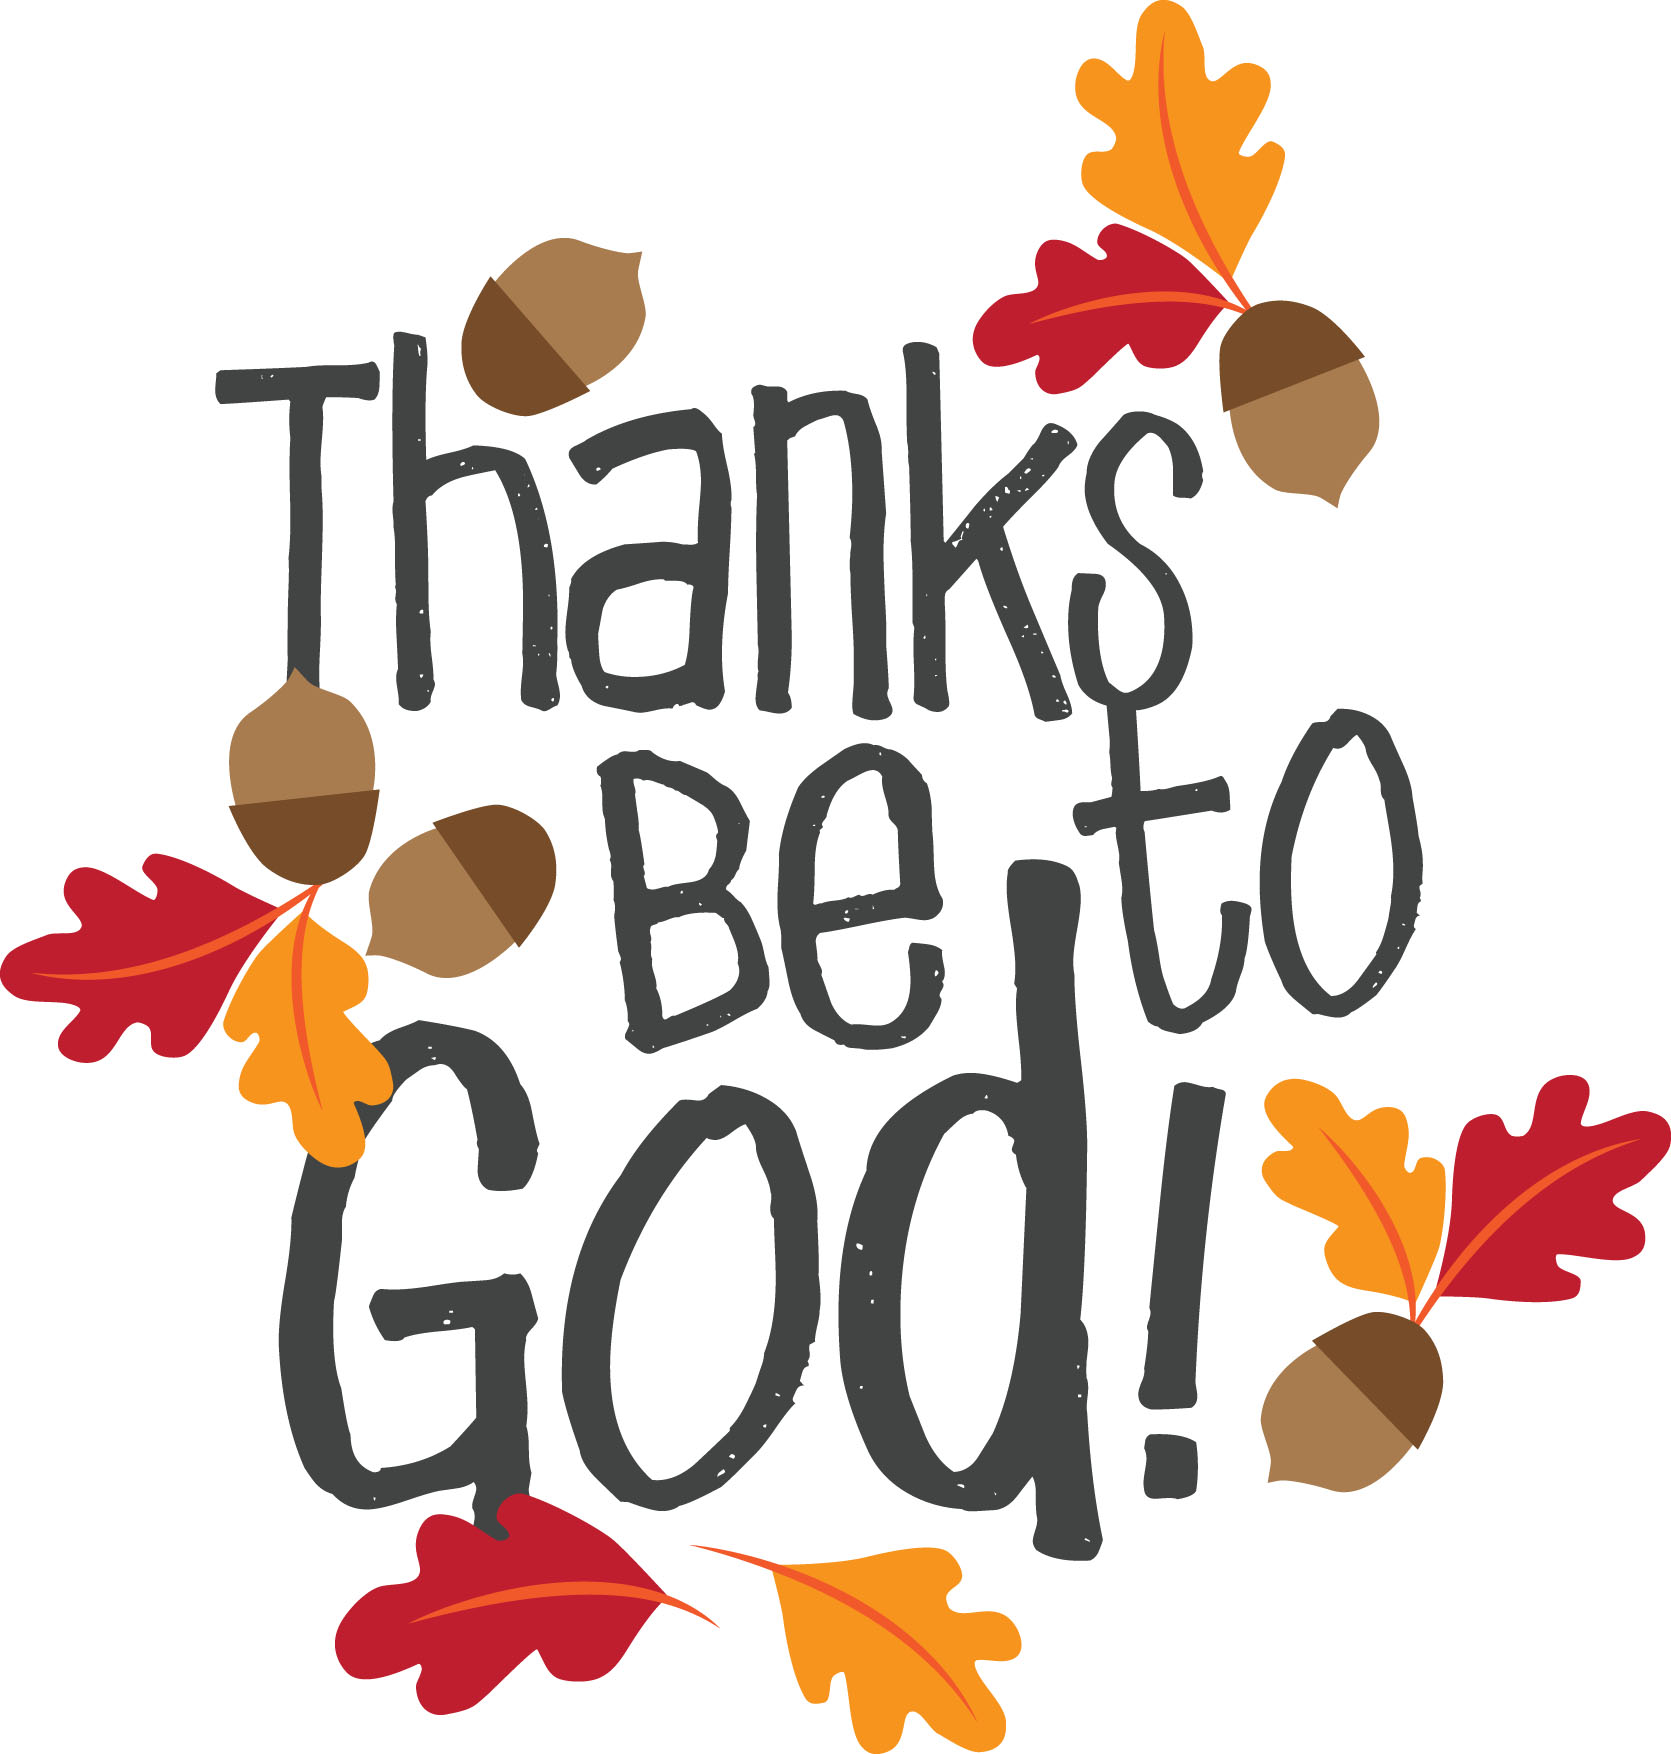 1671x1754 Thanksgiving Daythursday, November 24, 20161030am